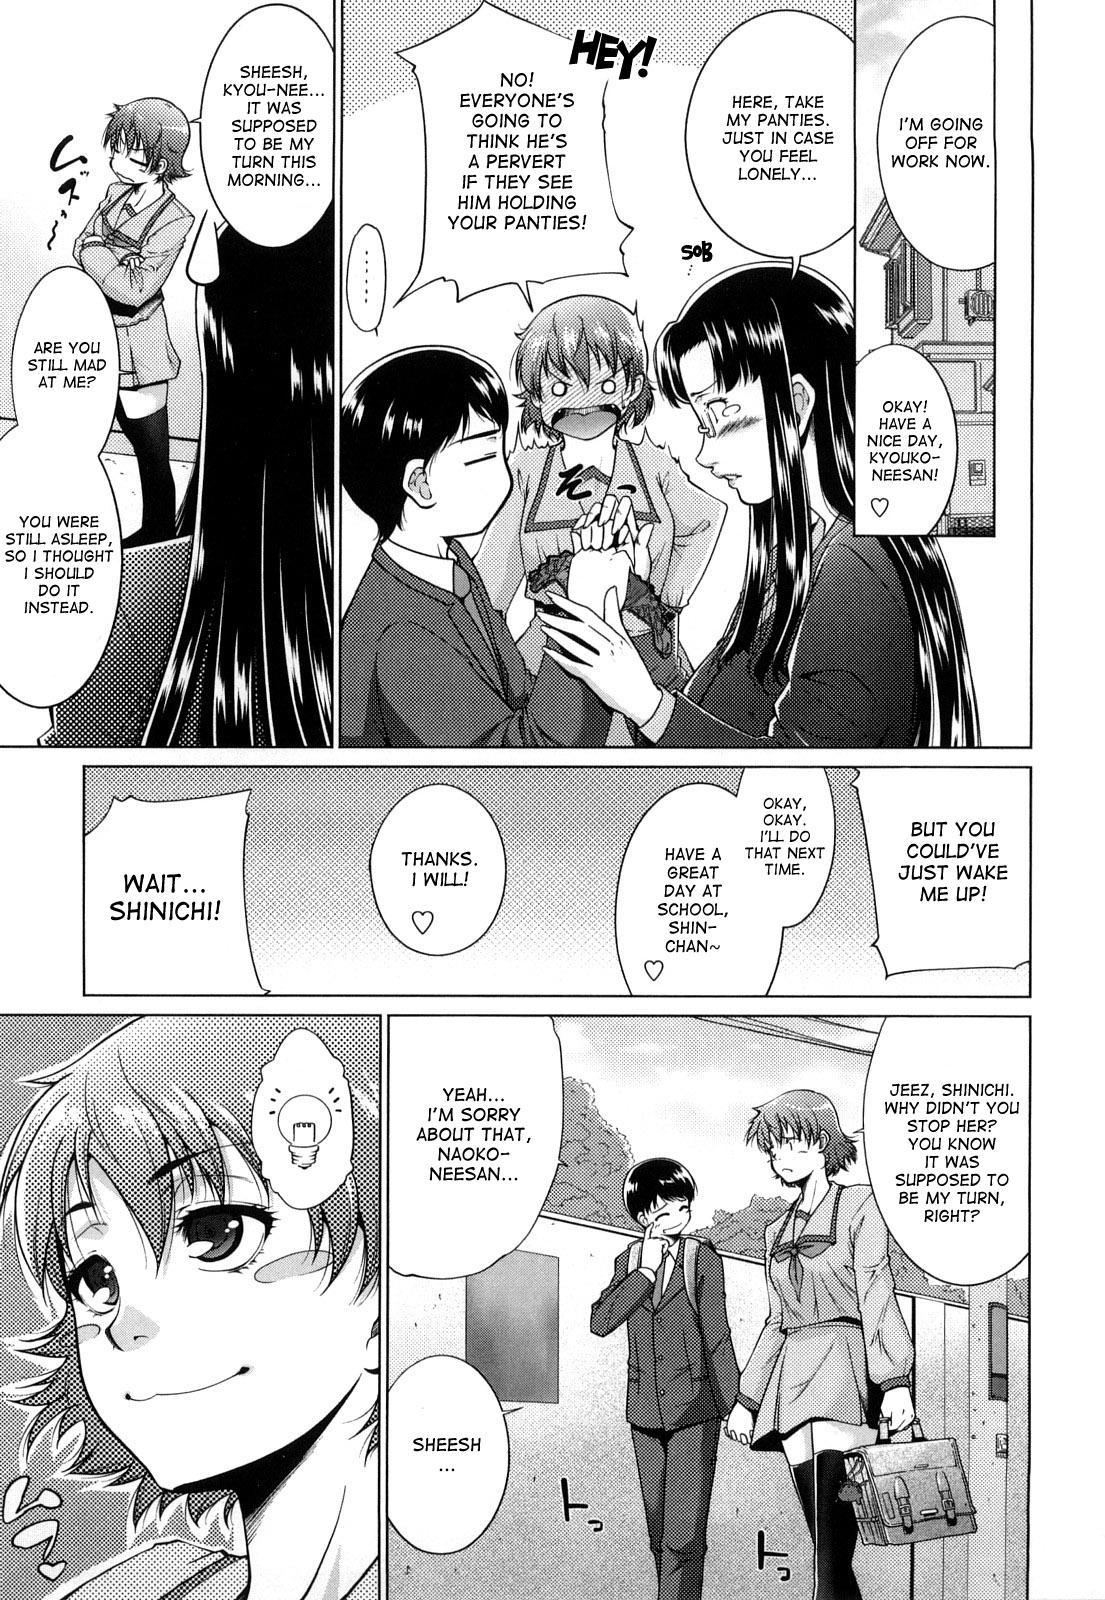 [Touma Itsuki] Ane-sama Inkou - Sister's Sexy Smell [English] {desudesu} 70